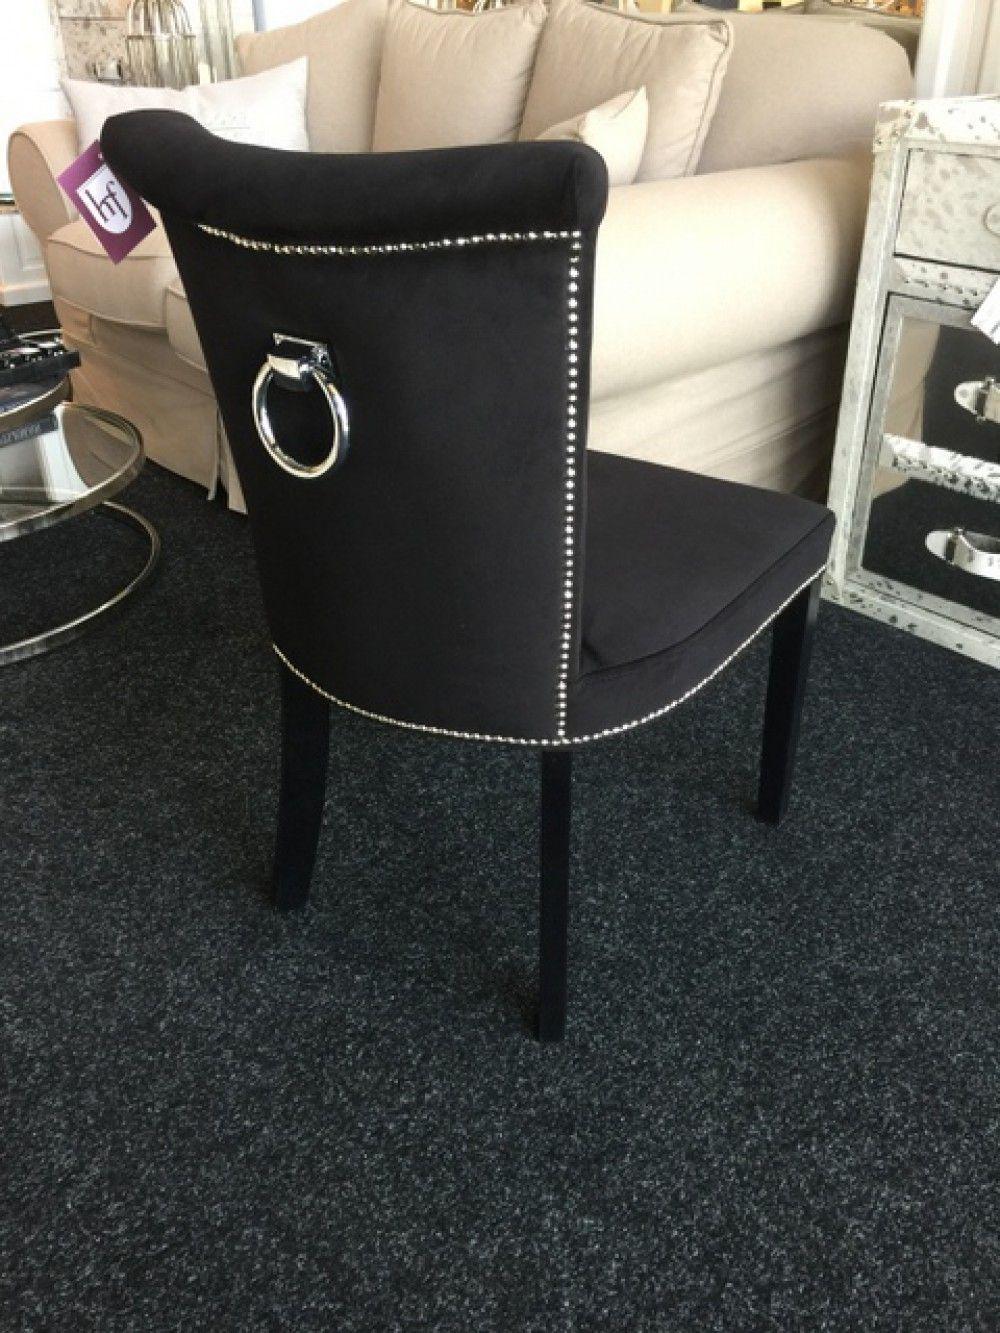 stuhl anthrazit gepolstert stuhl mit einem ring landhaus style m bel esszimmer st hle. Black Bedroom Furniture Sets. Home Design Ideas